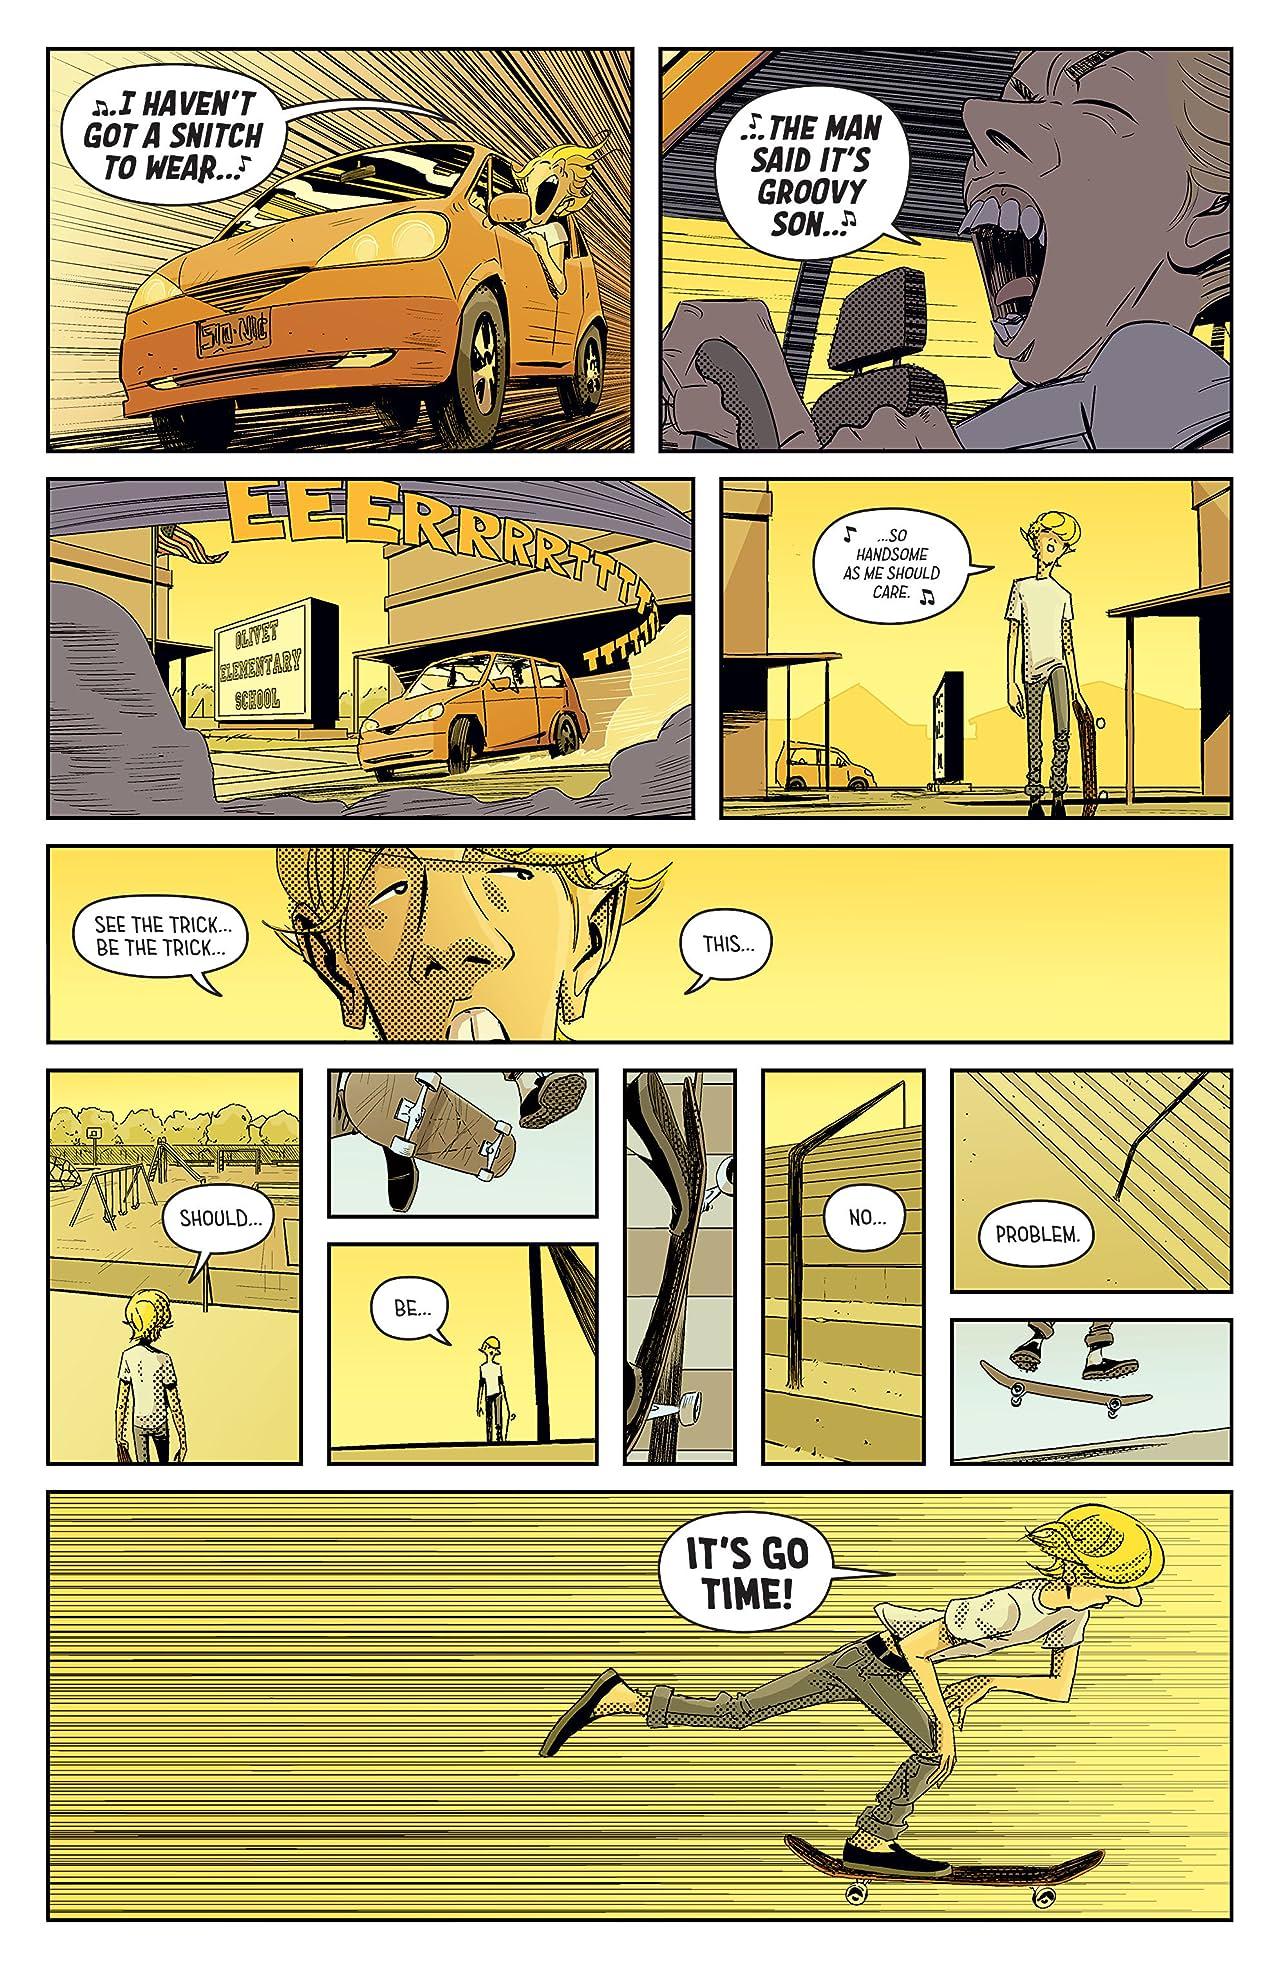 Strange Sports Stories (2015) #2